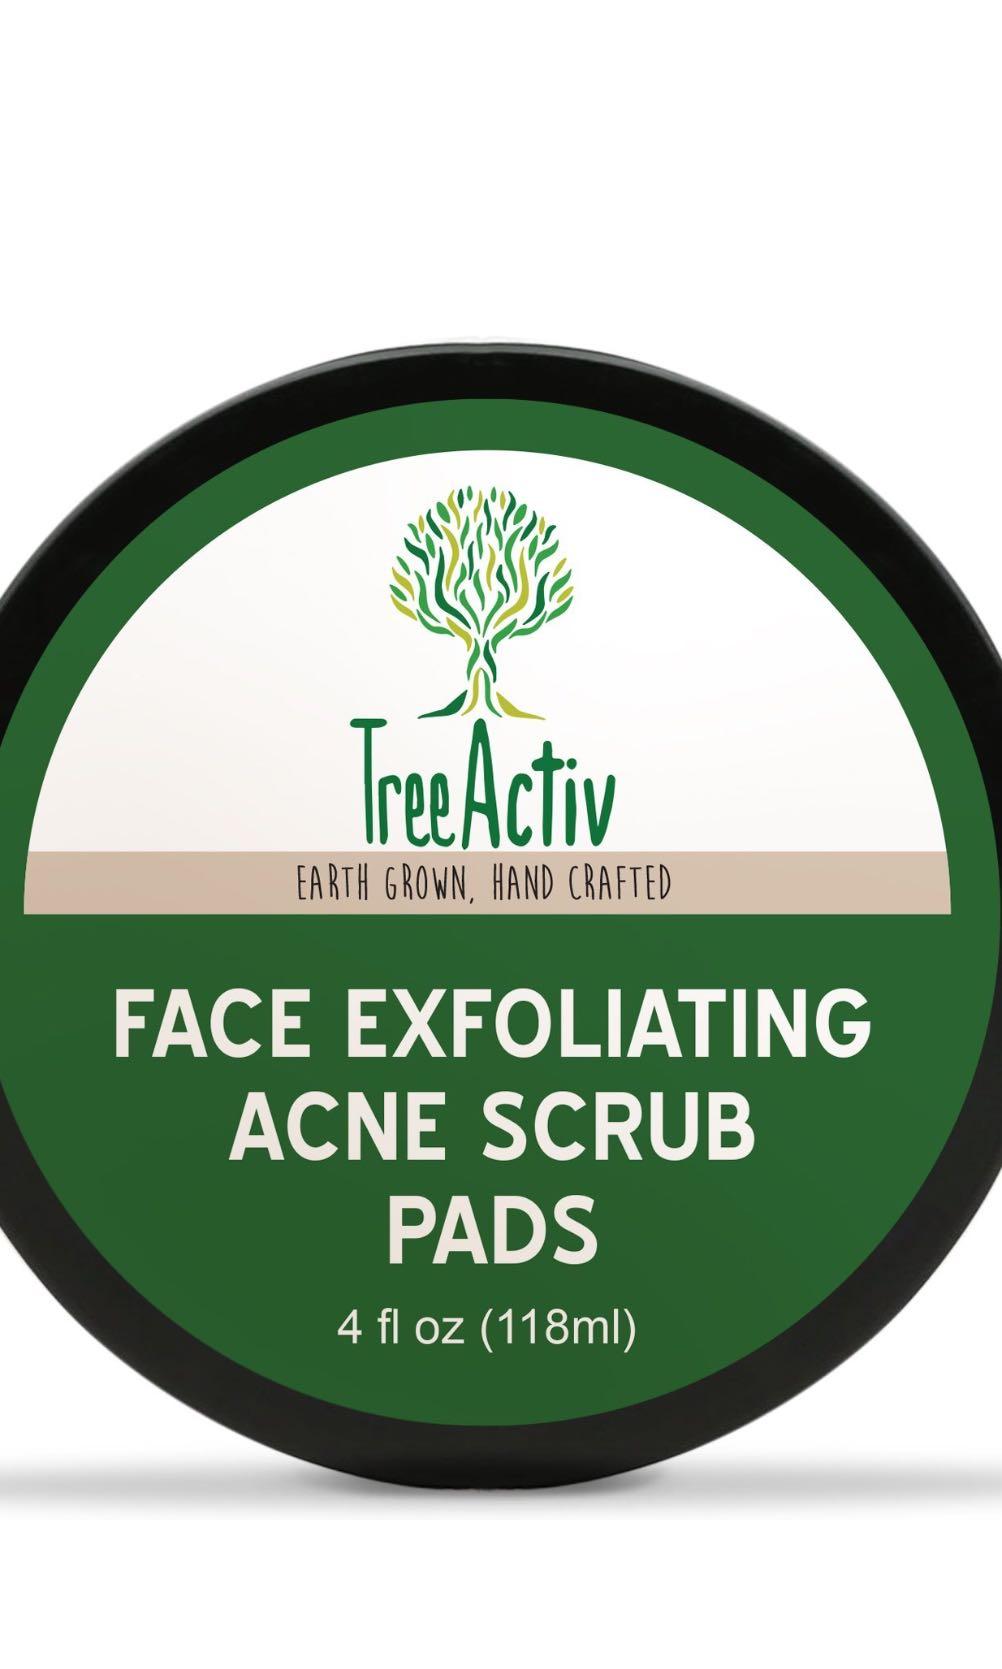 Acne scrub ( it really works )